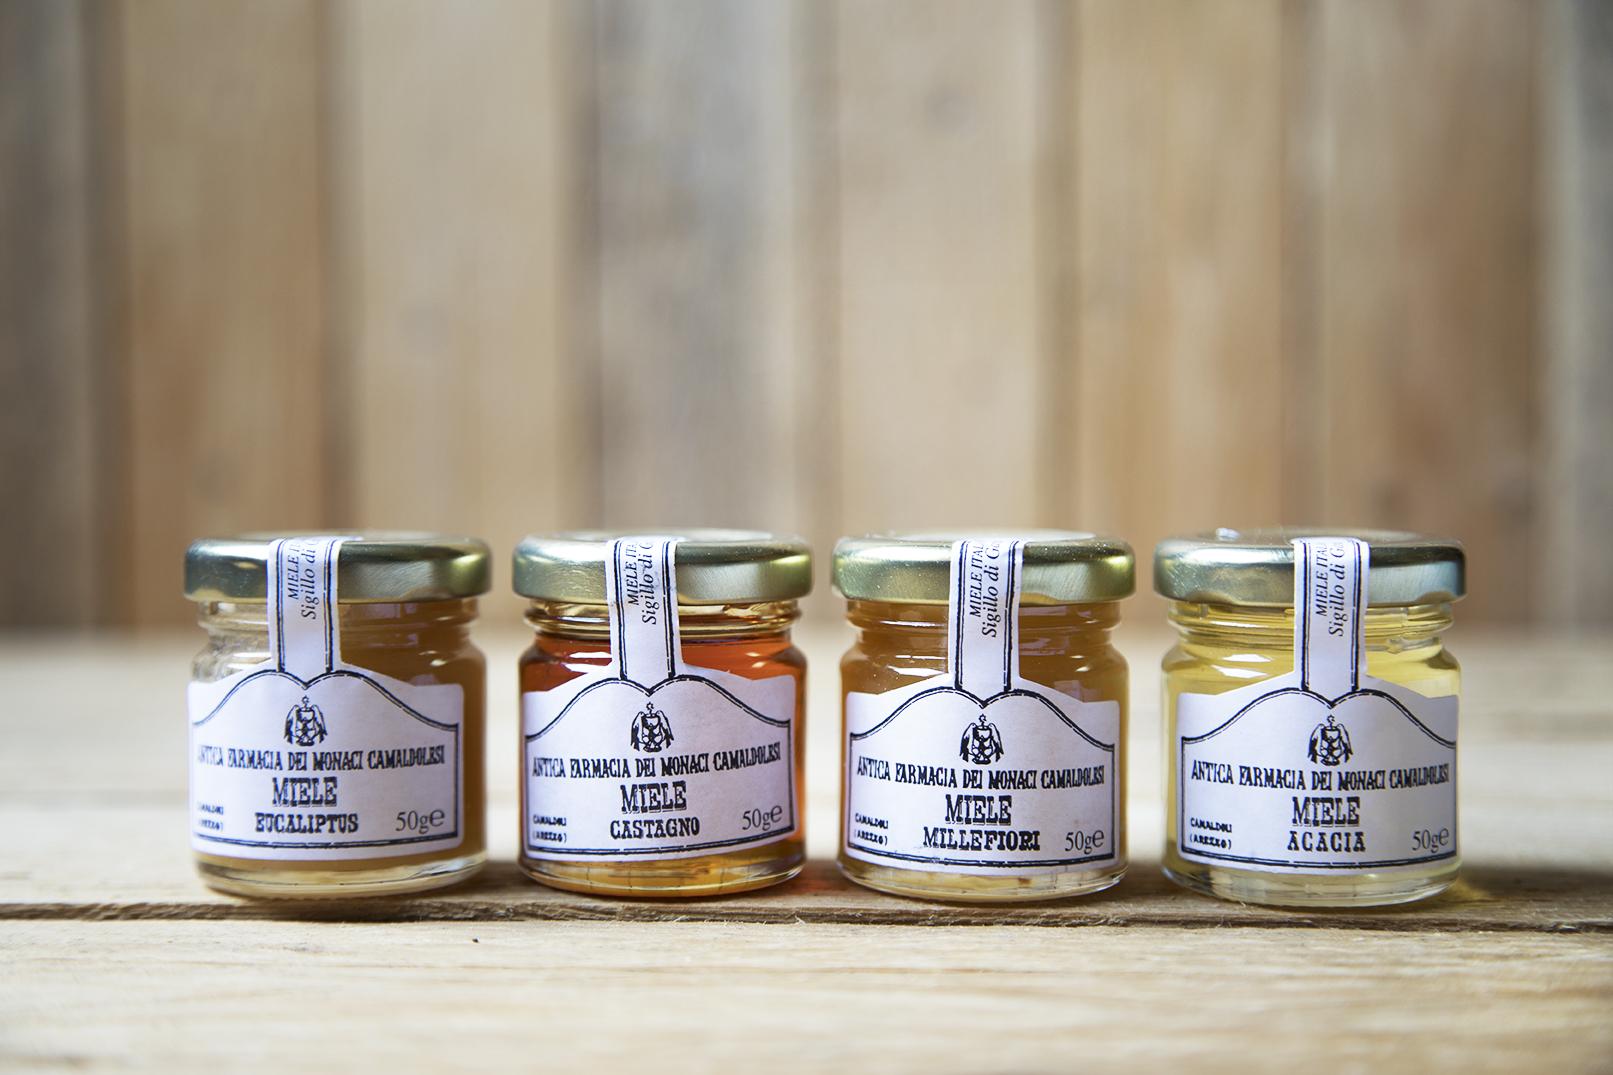 4 tipologie di miele